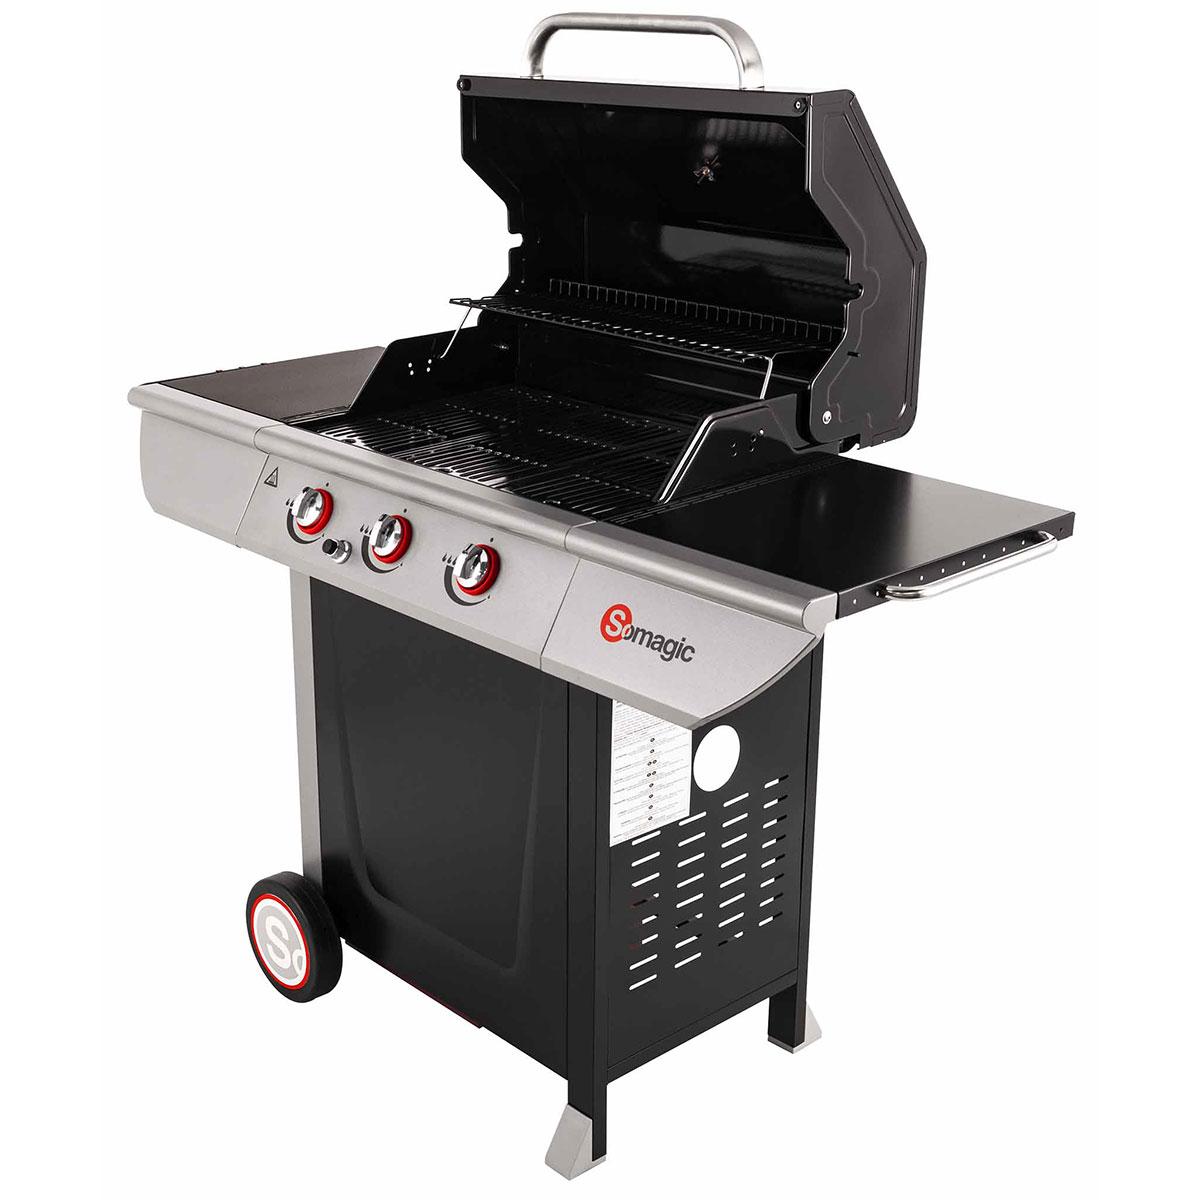 barbecue gaz avec couvercle de cuisson inox. Black Bedroom Furniture Sets. Home Design Ideas